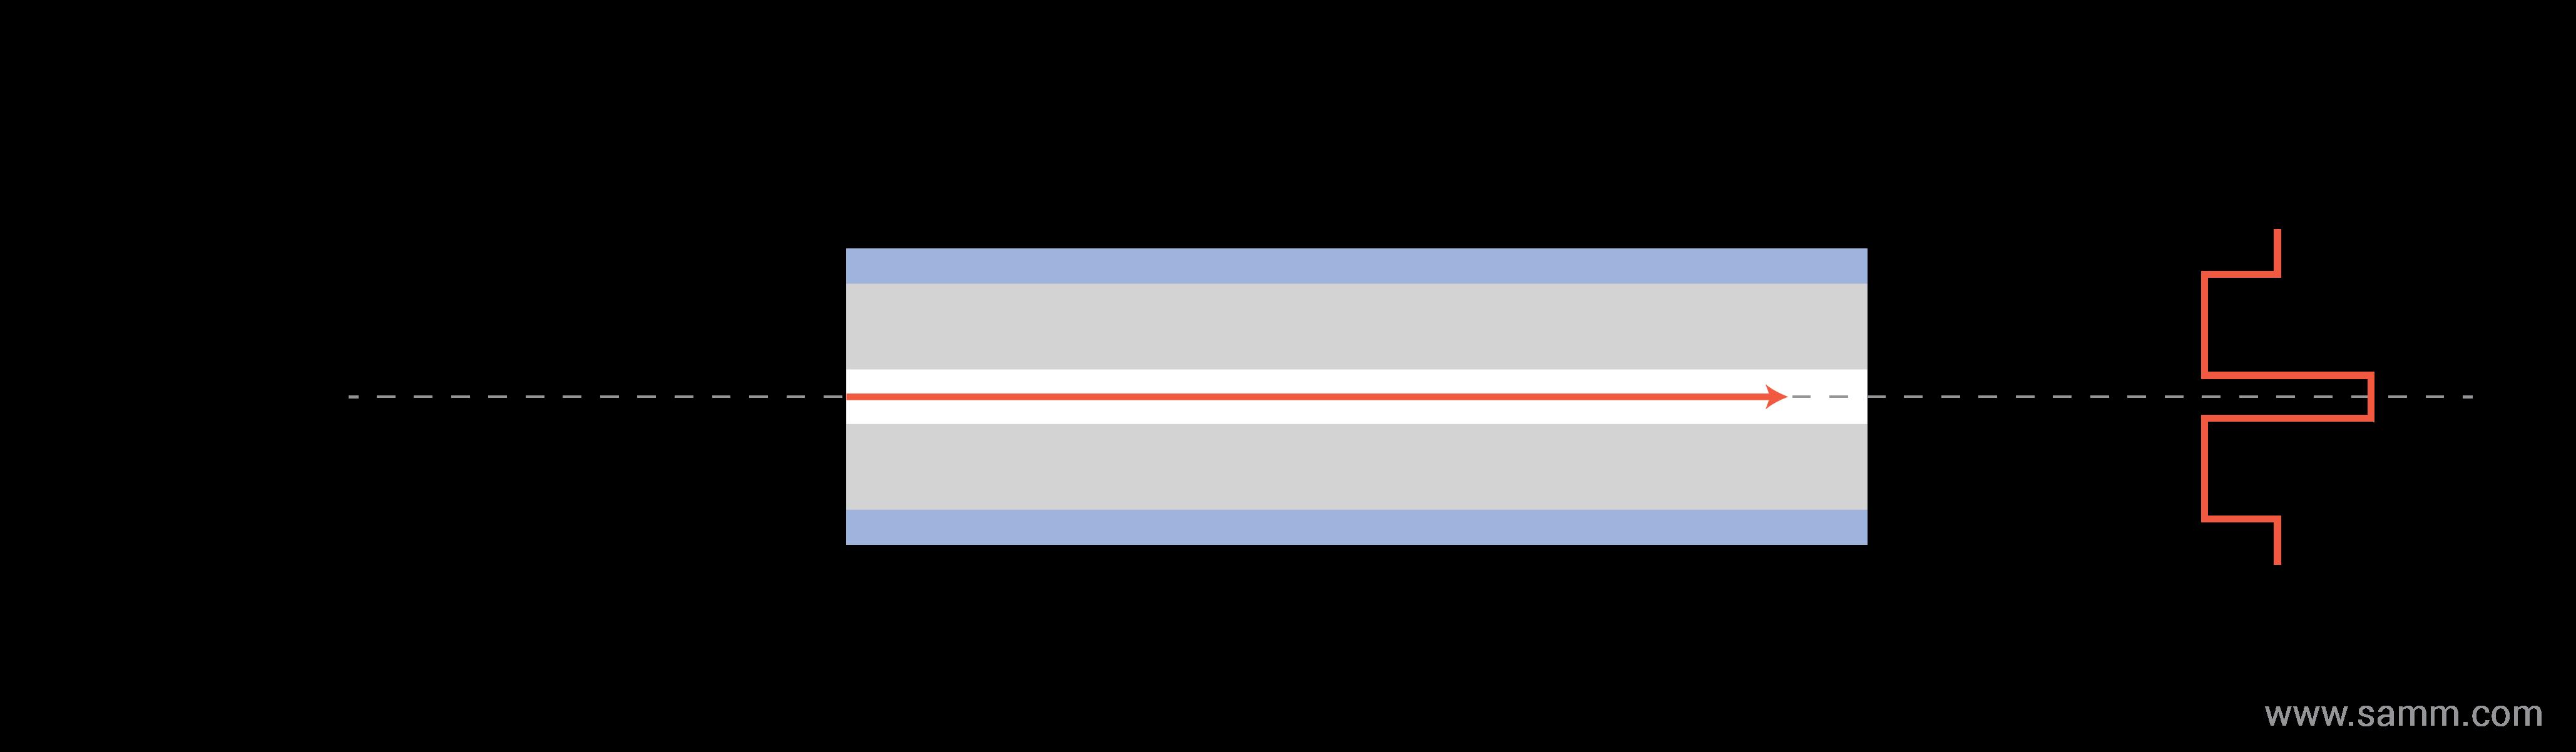 optik-fiber-tipleri-sinyal-tek mod-mono-indisi-